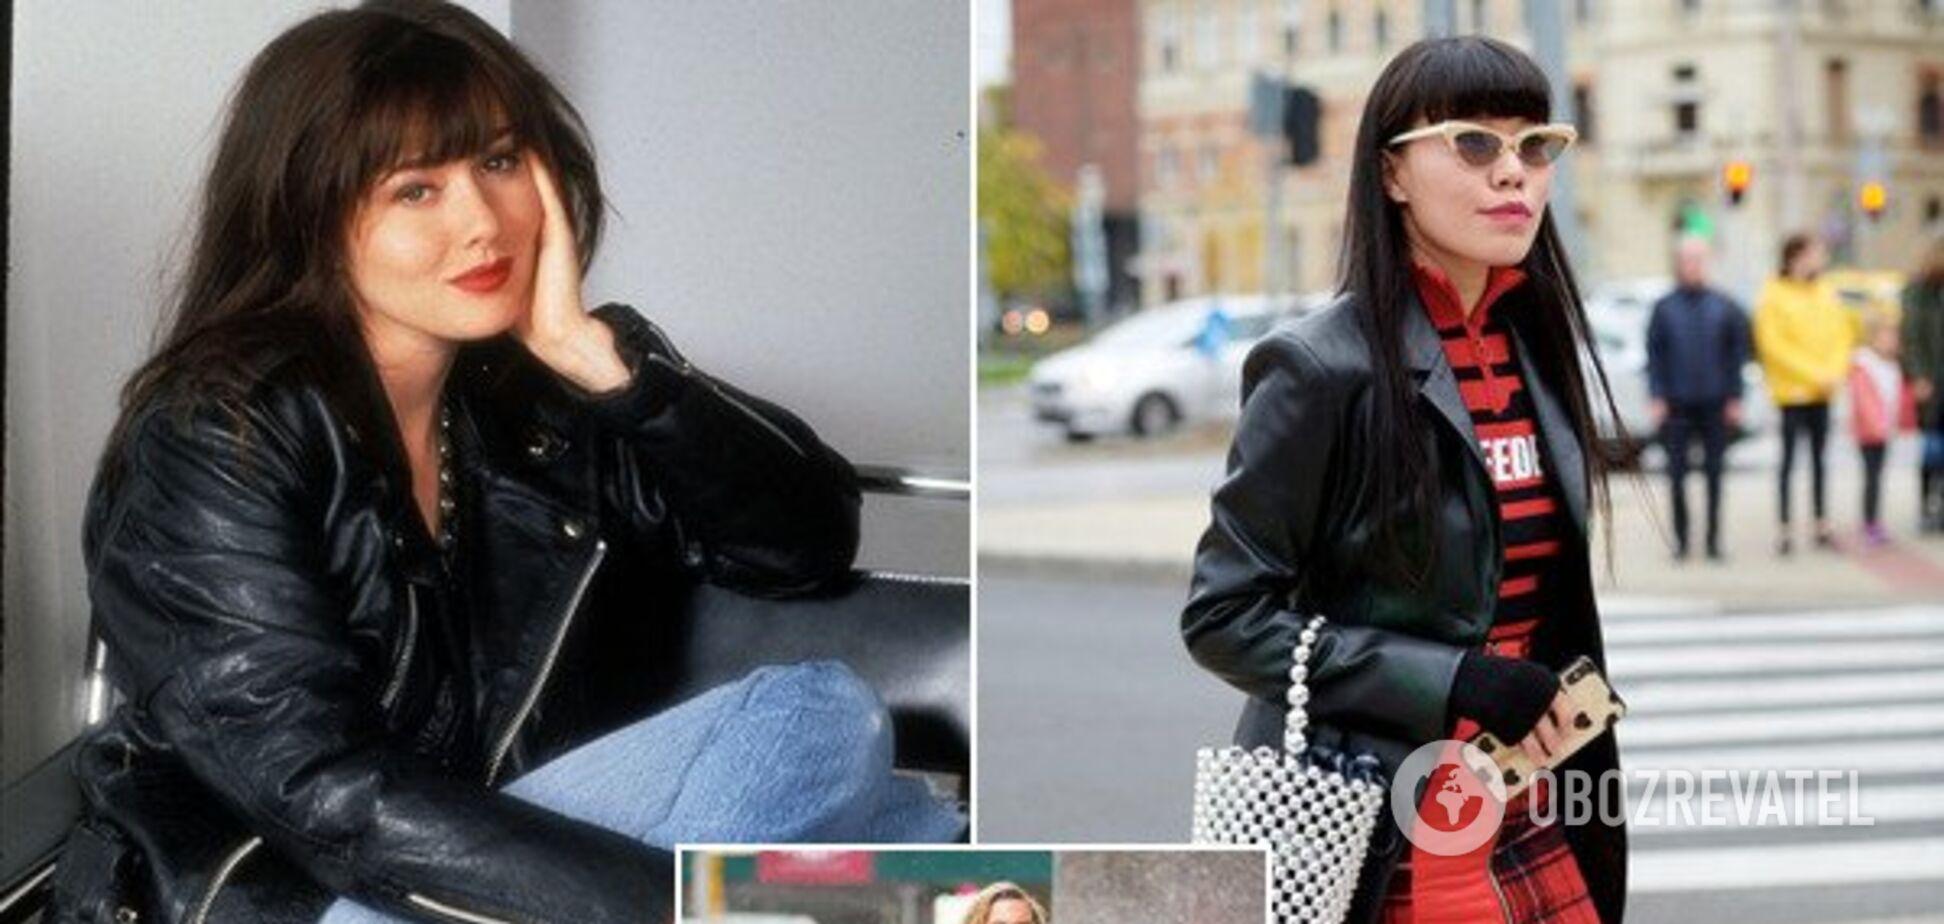 Мода 90-х: 5 культовых трендов, которые мы не забудем